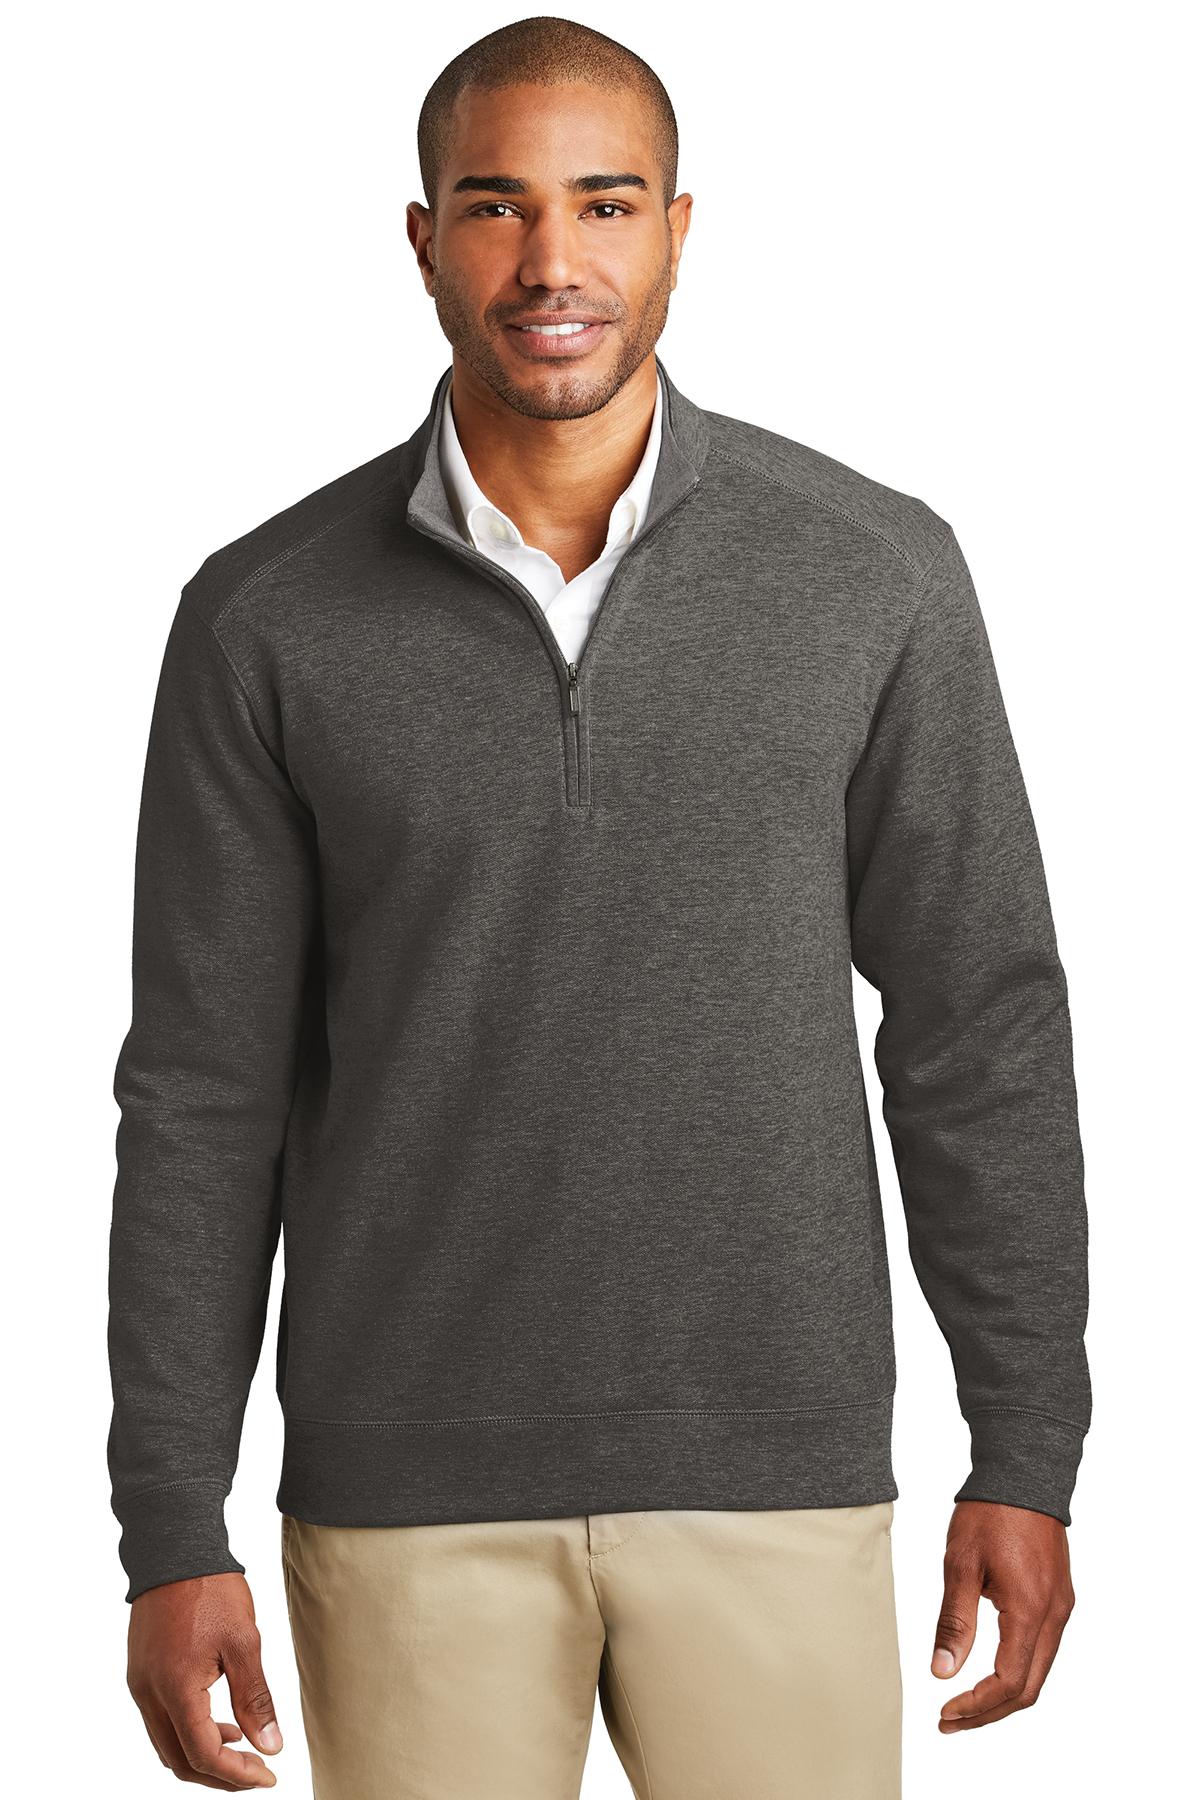 b885be133 Port Authority® Interlock 1/4-Zip   Sweaters   Polos/Knits   SanMar